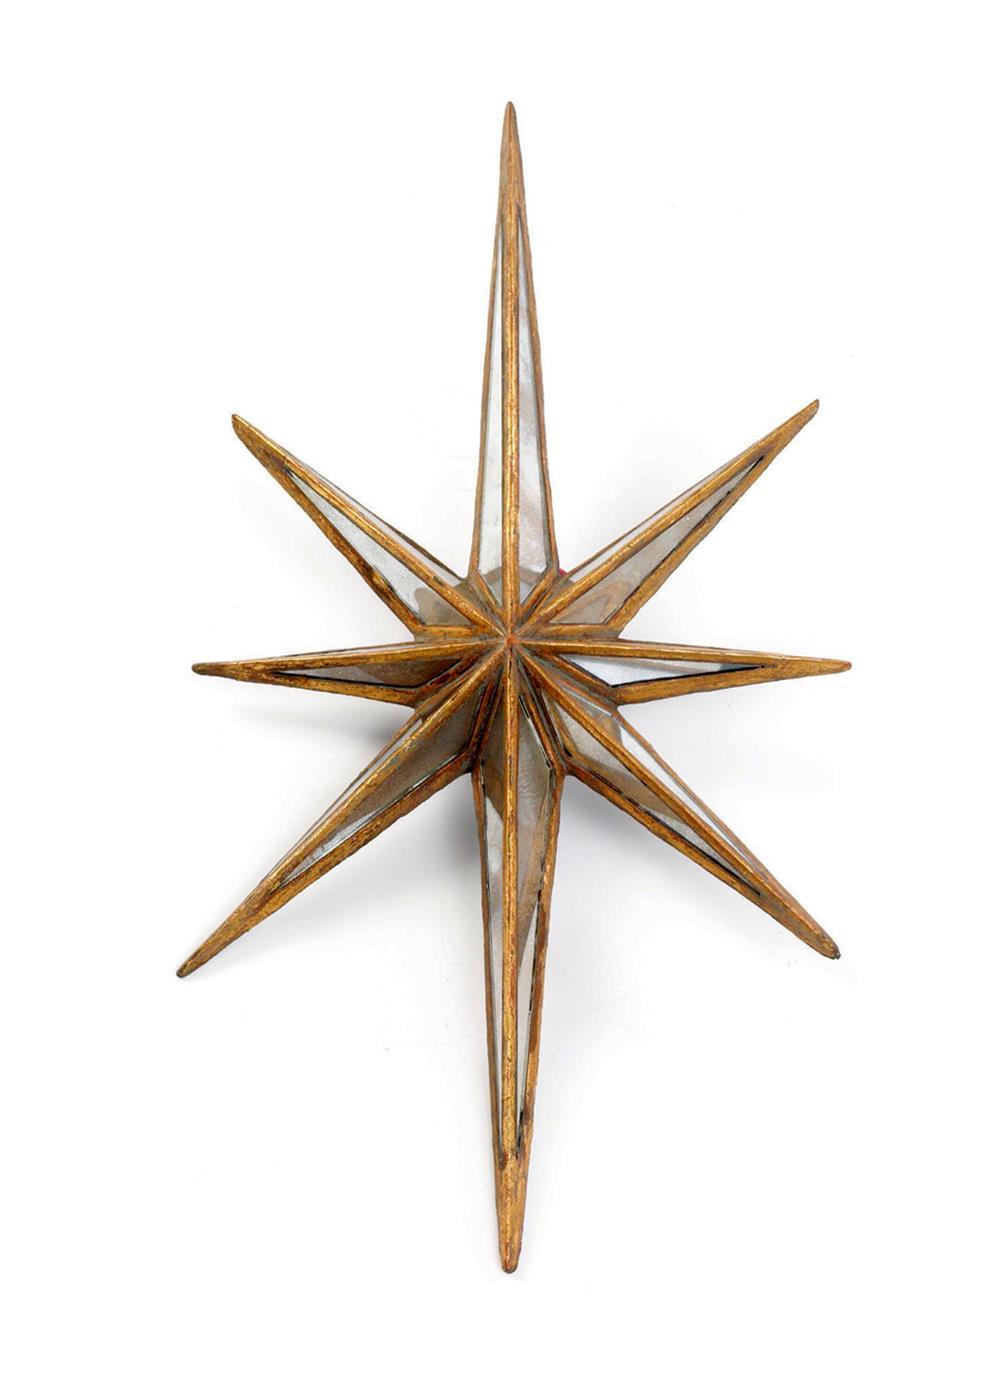 large antique gold mirror star burst object sculpture